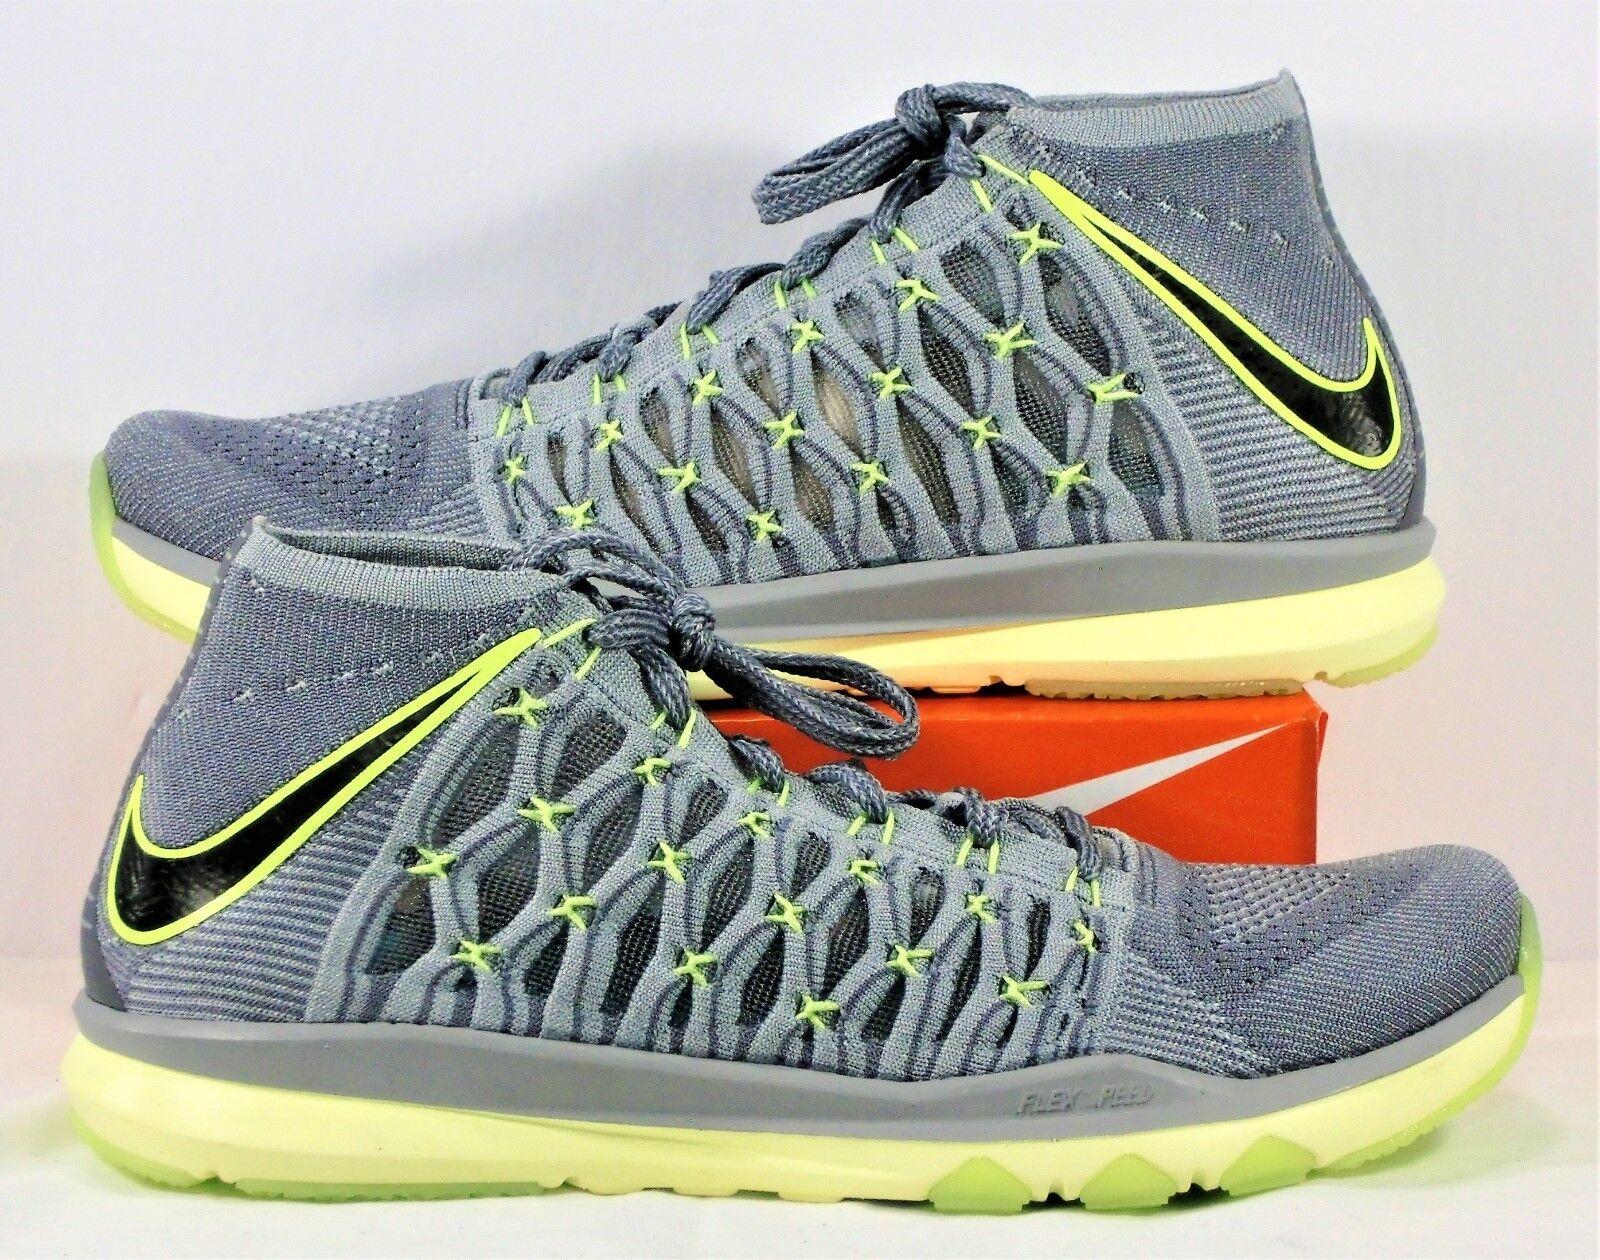 Nike Train Ultrafast Flyknit CR7 Metcon Cristiano Ronaldo Sz 8 NEW 844524 001 best-selling model of the brand